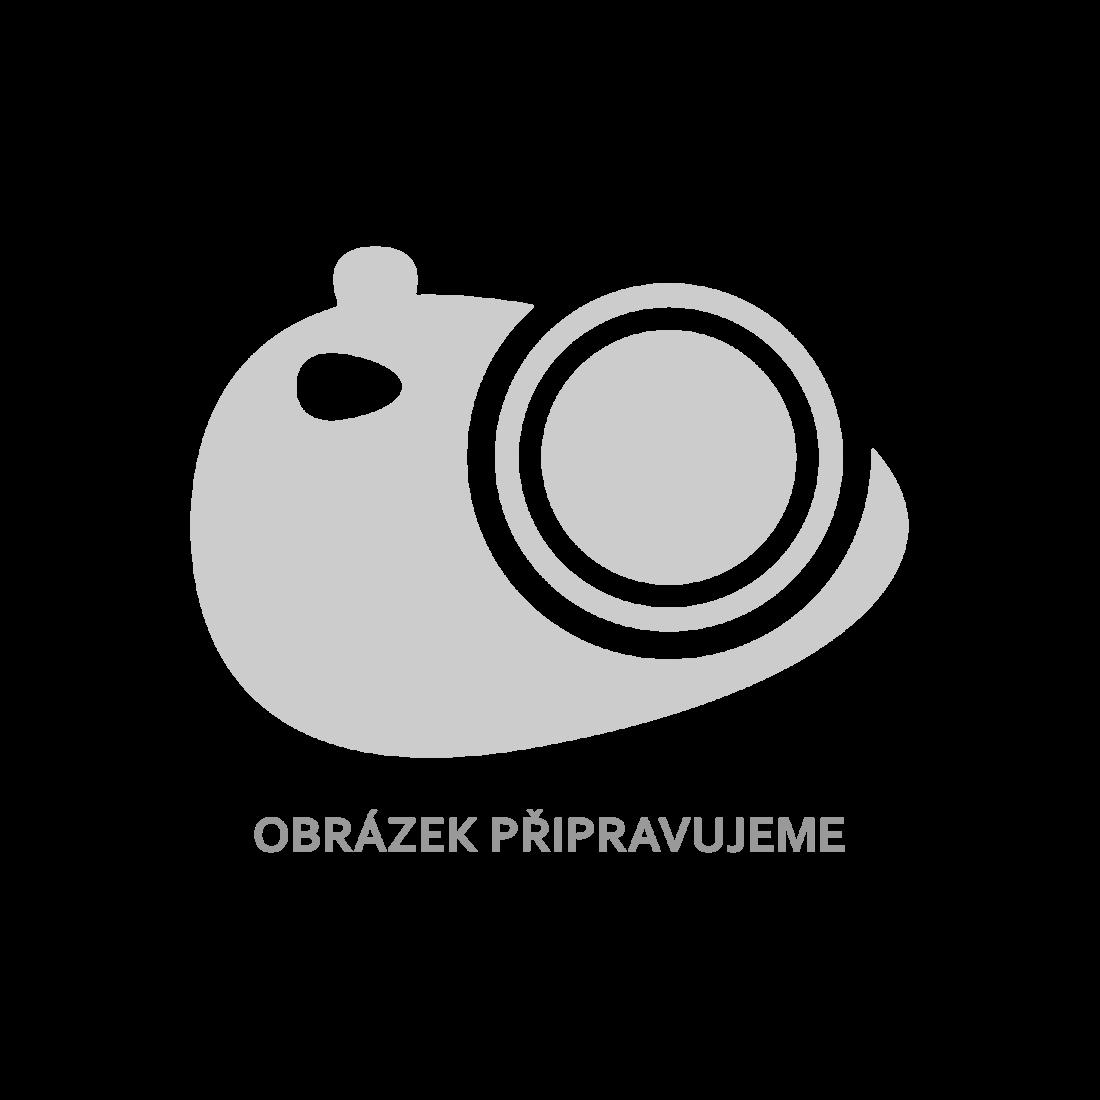 vidaXL Šatní skříň šedá 100 x 50 x 200 cm dřevotříska [800227]